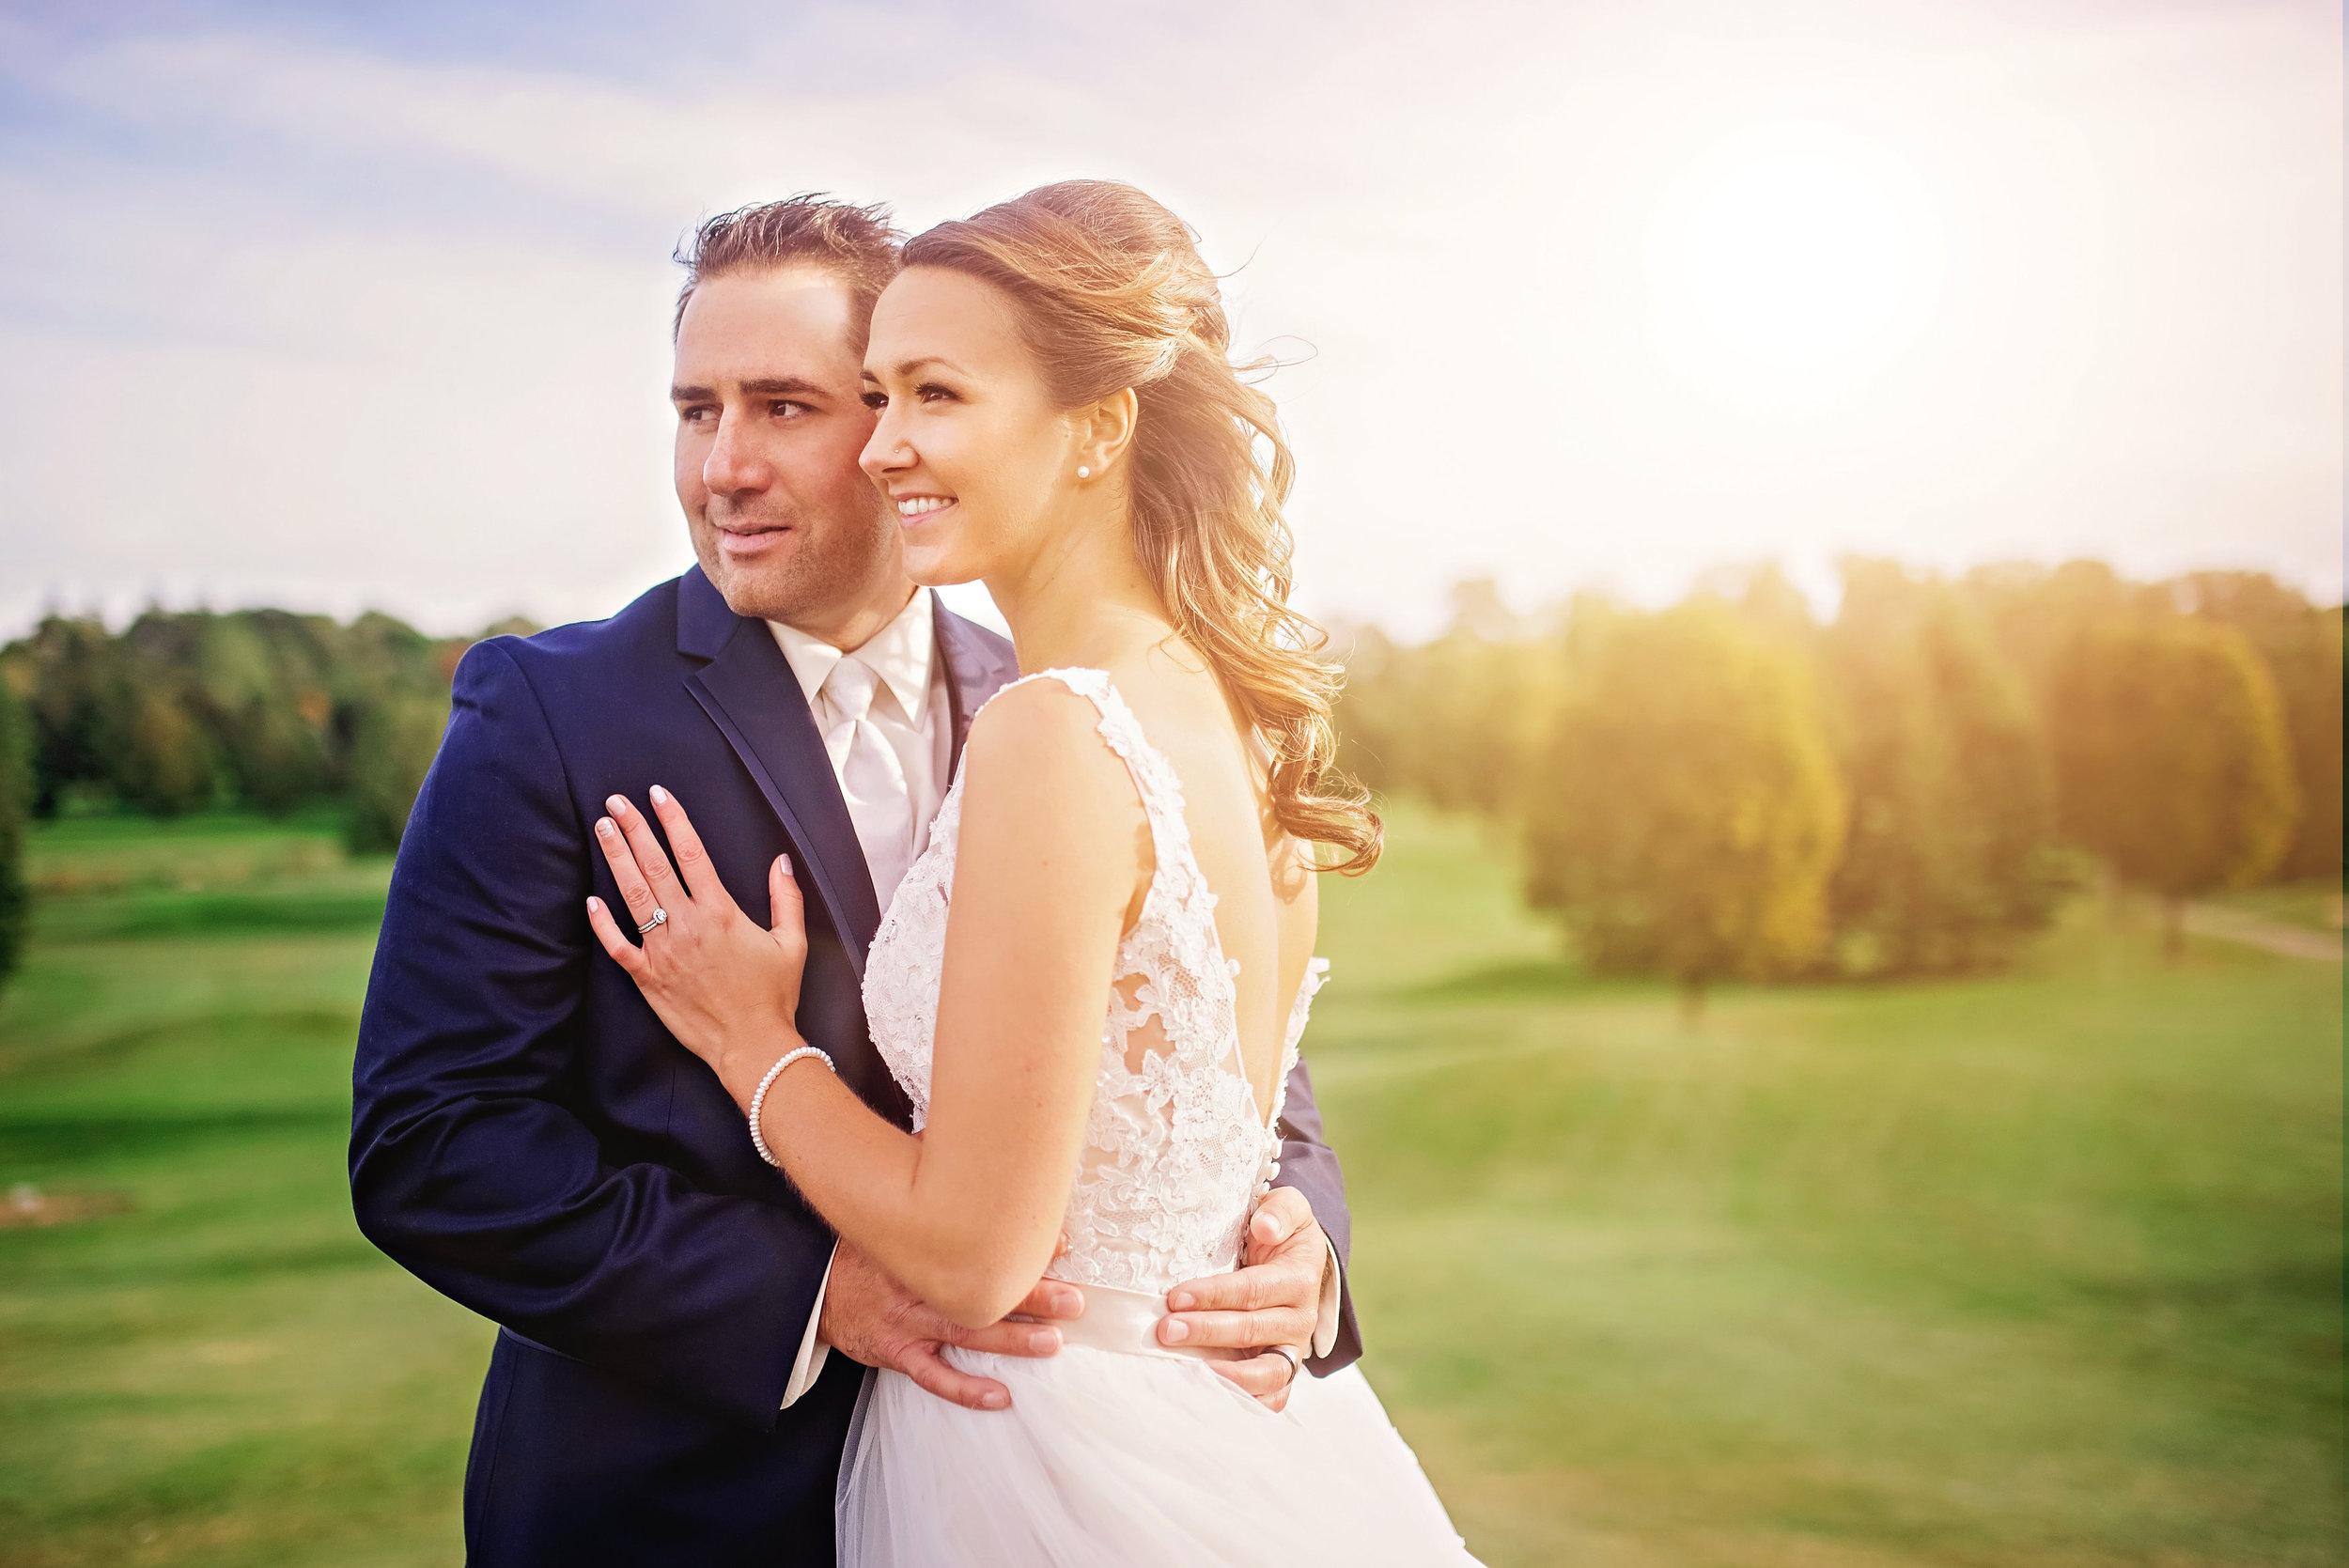 wedding-venue-outdoor-golf-course